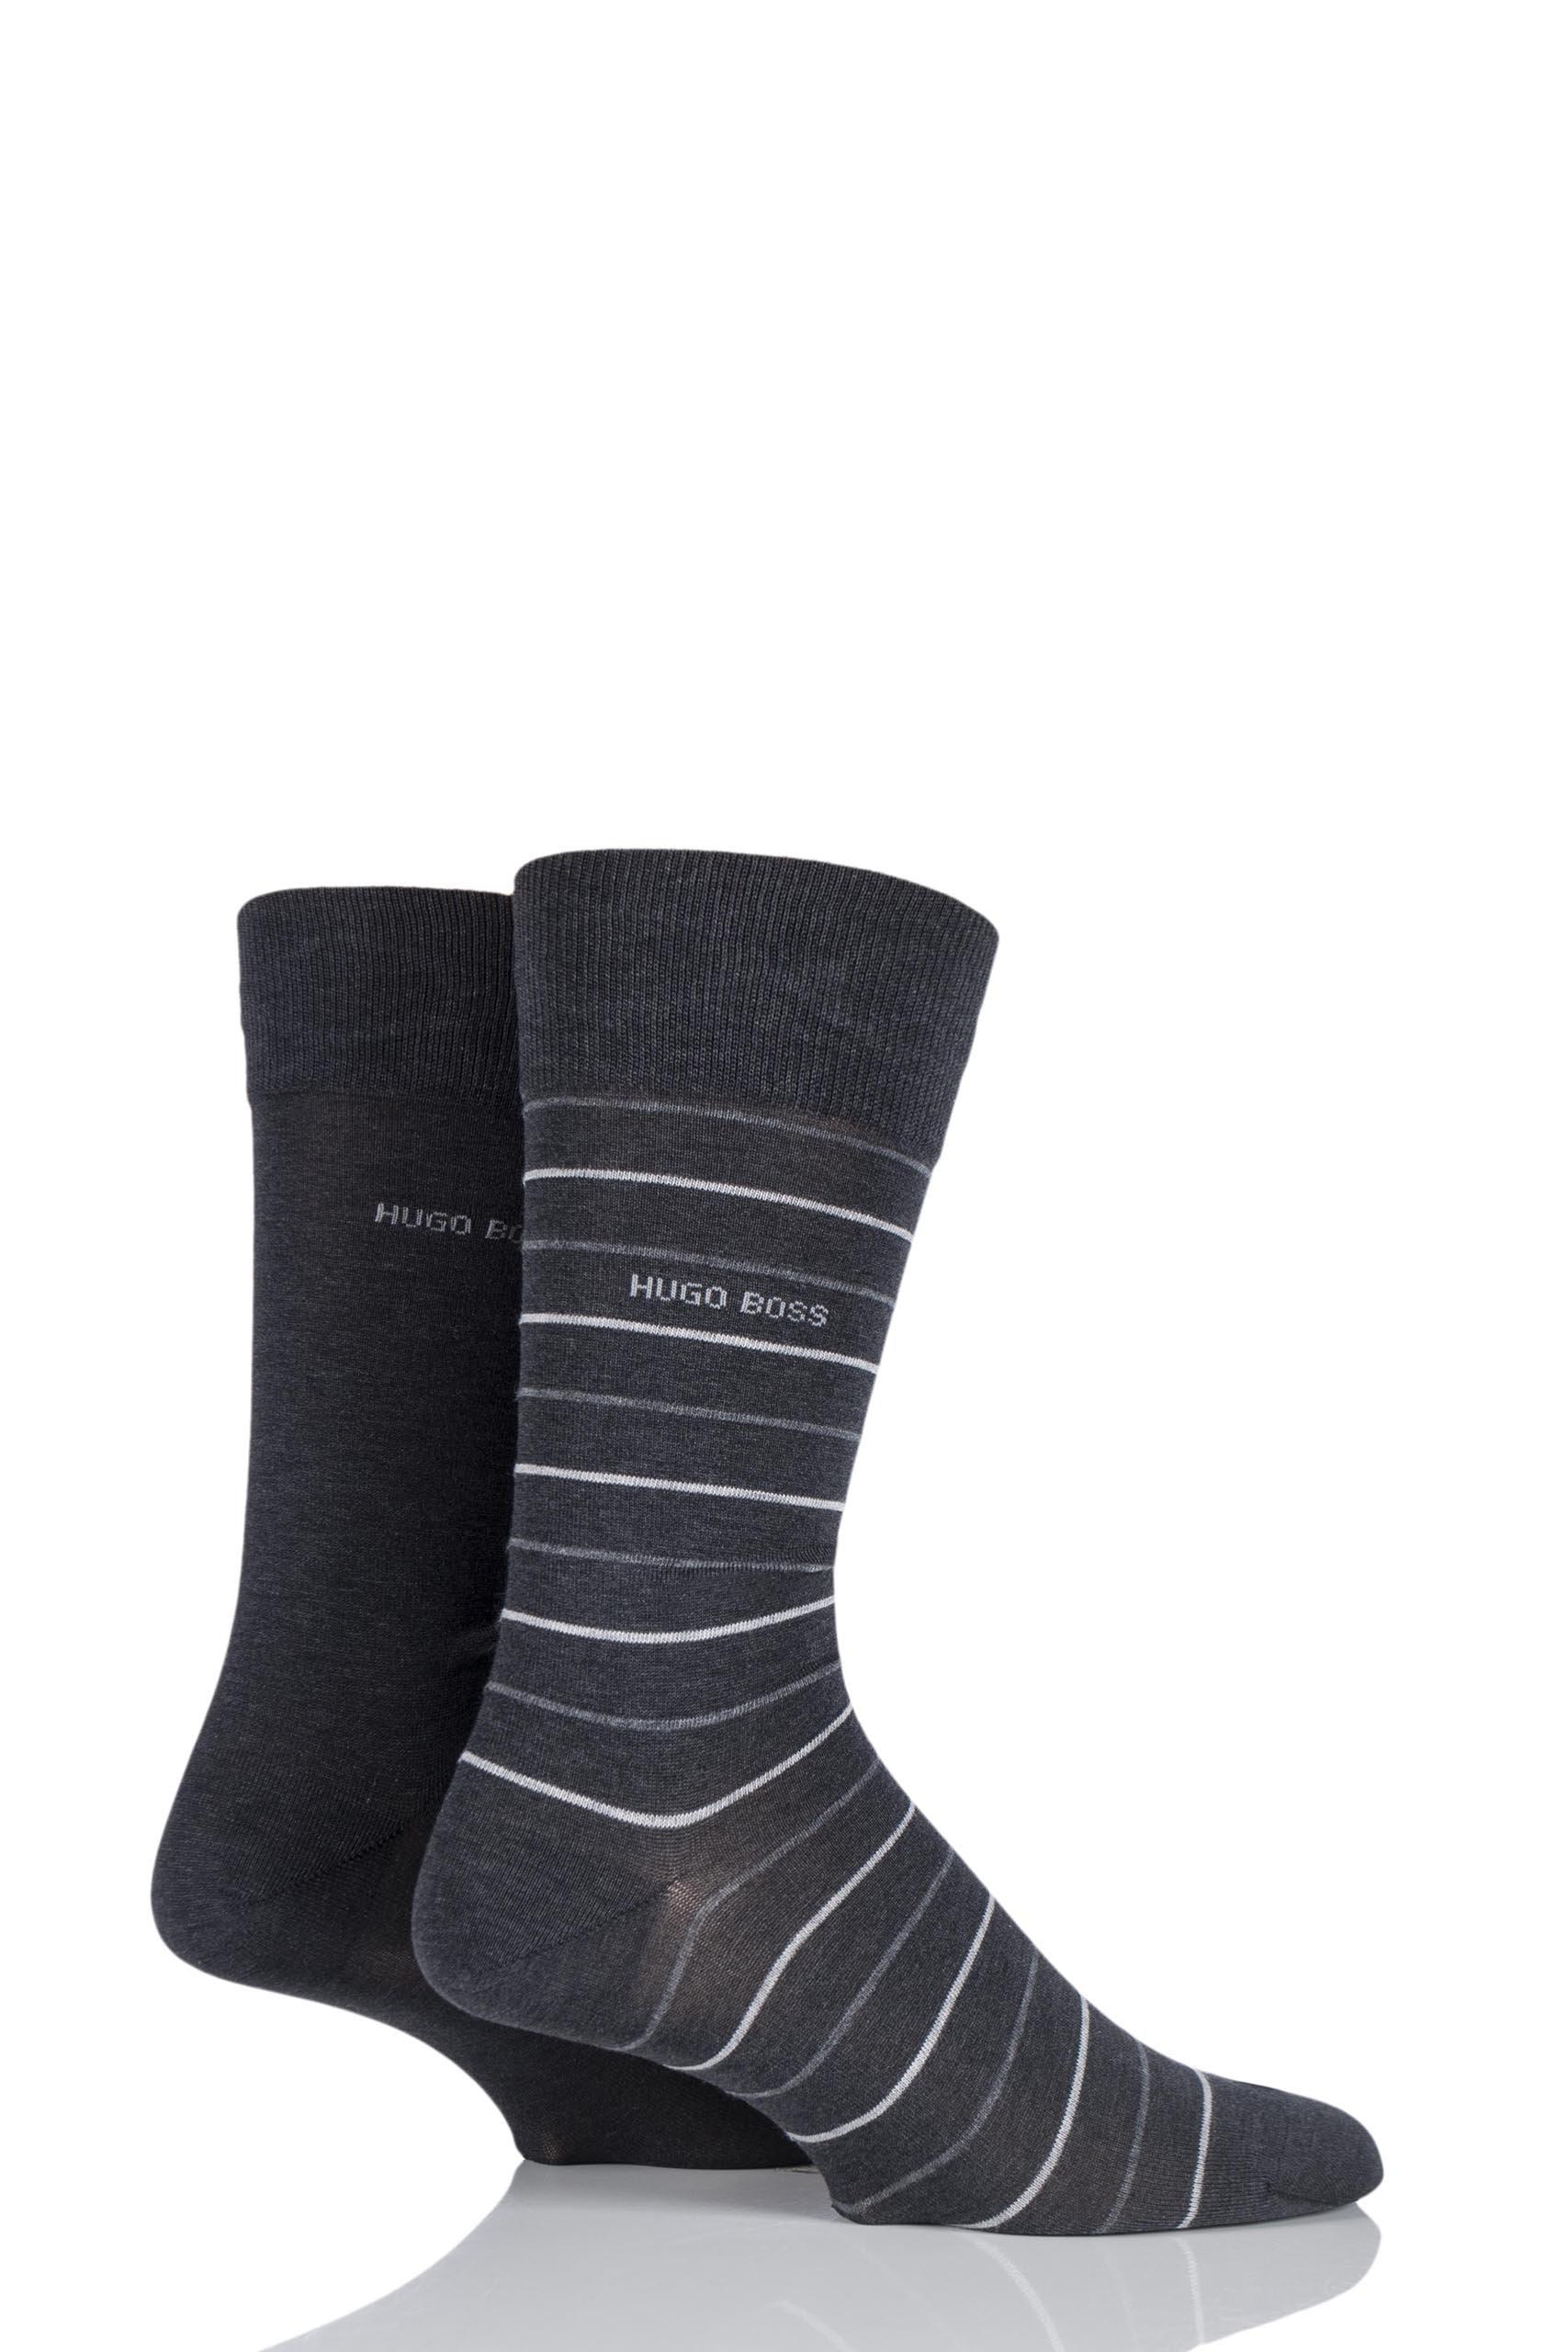 Mens 2 Pair Hugo Boss Fine Striped and Plain Mercerised Cotton Socks Charcoal 5.5-8